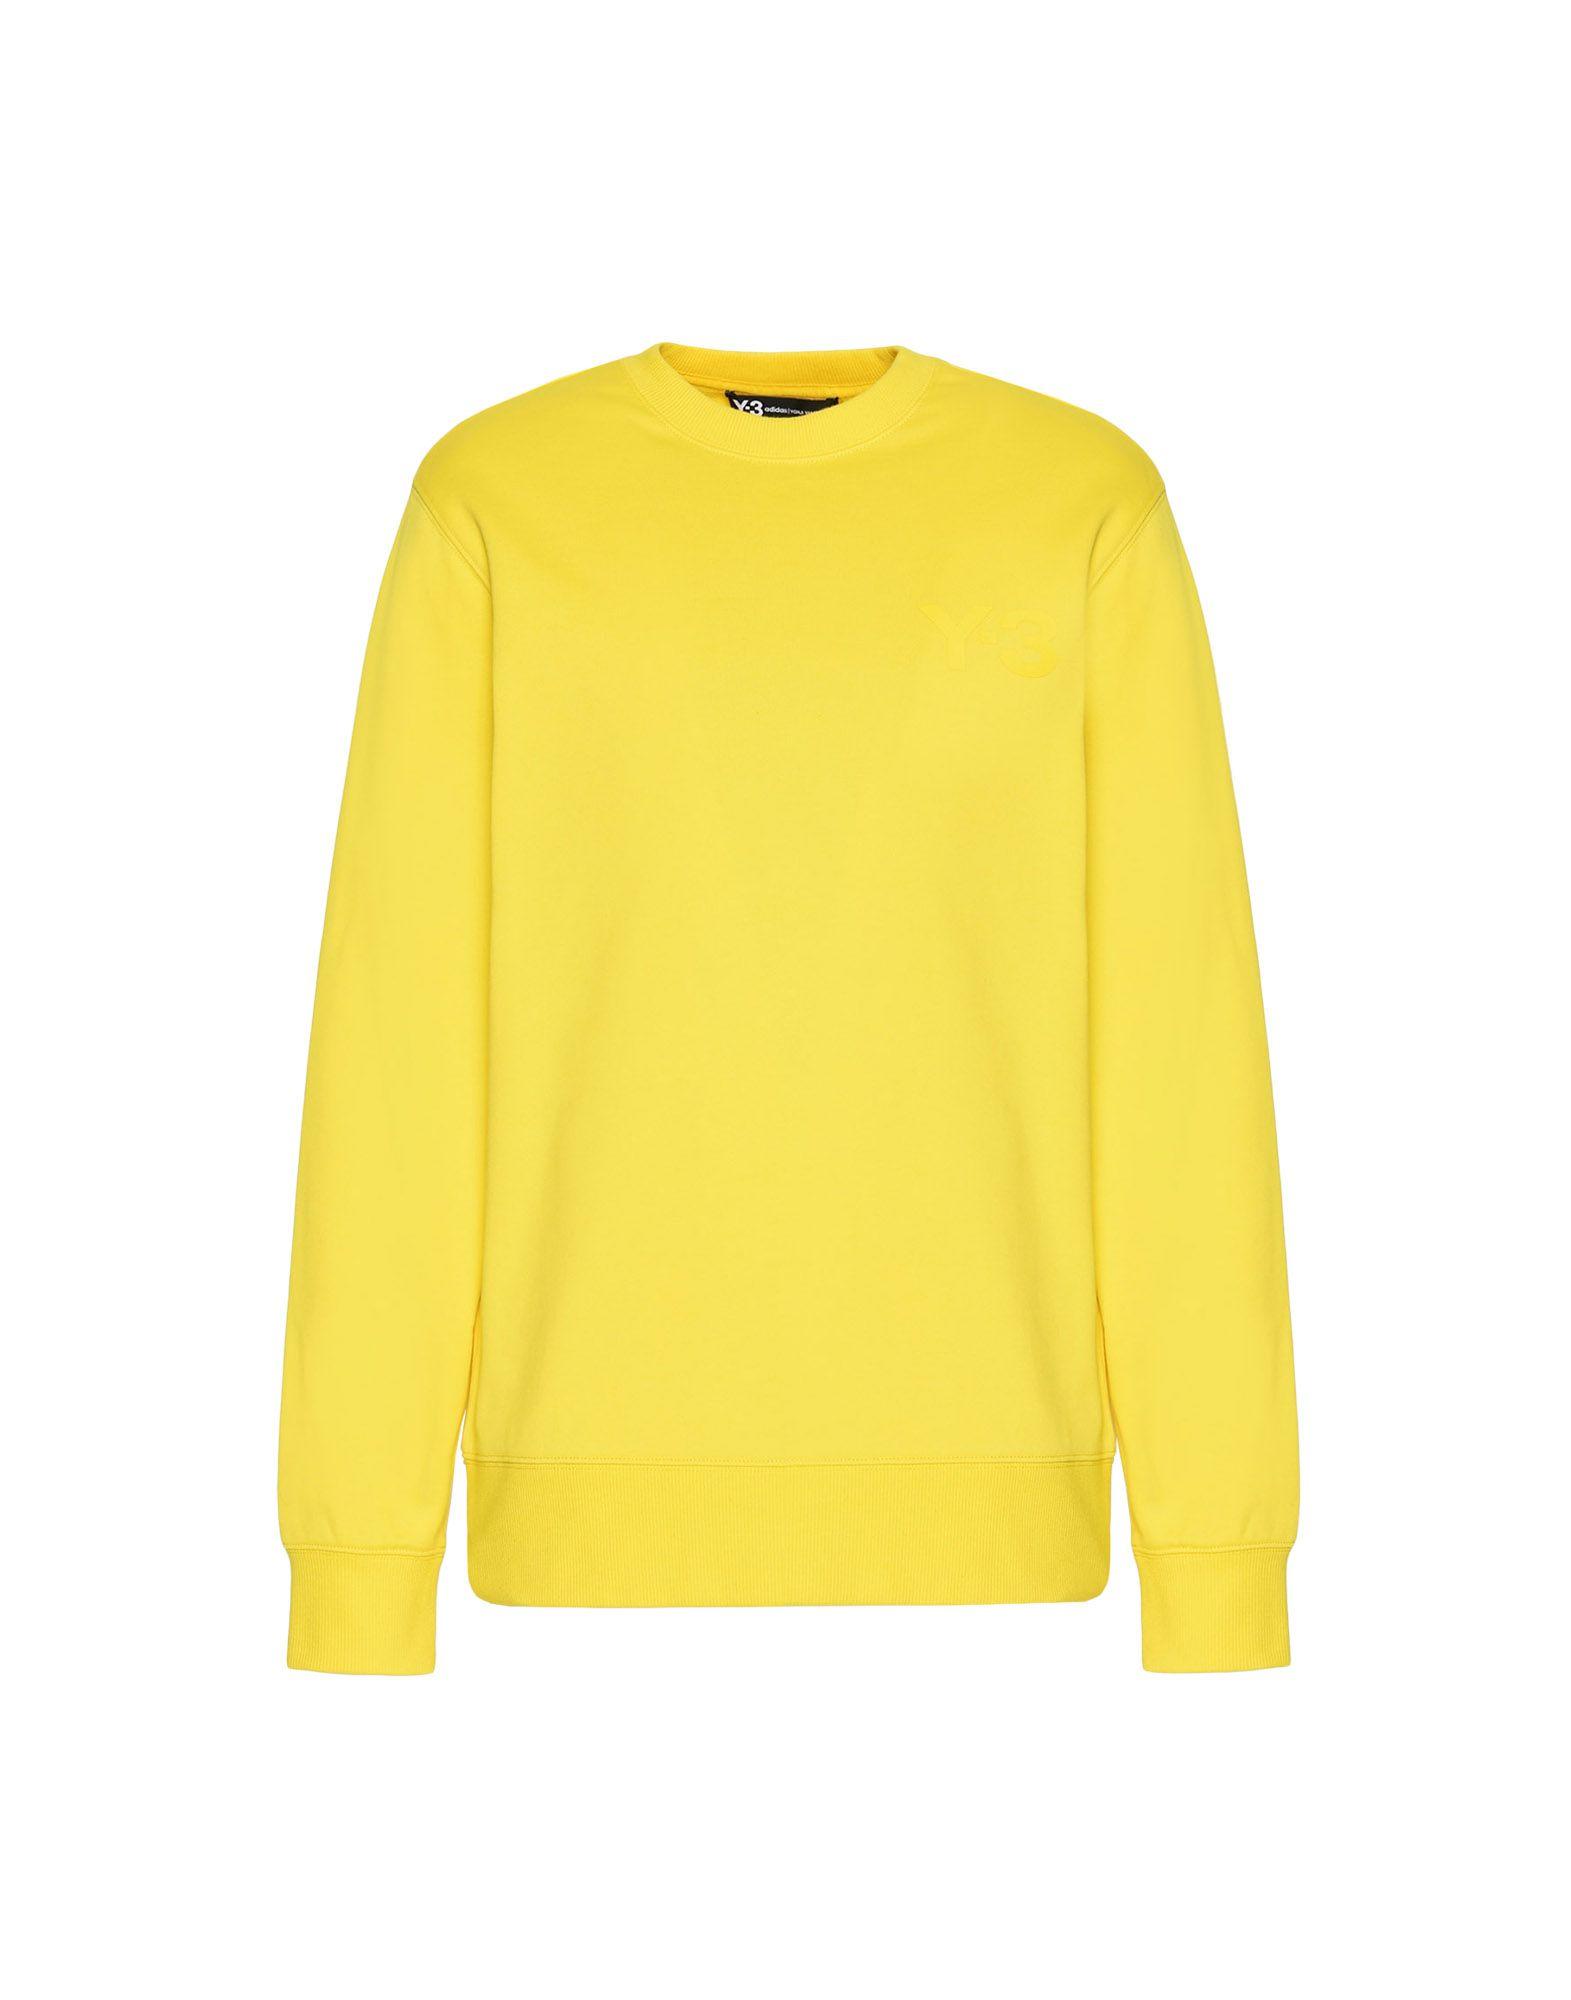 Y-3 Y-3 Classic Sweater スウェット メンズ f